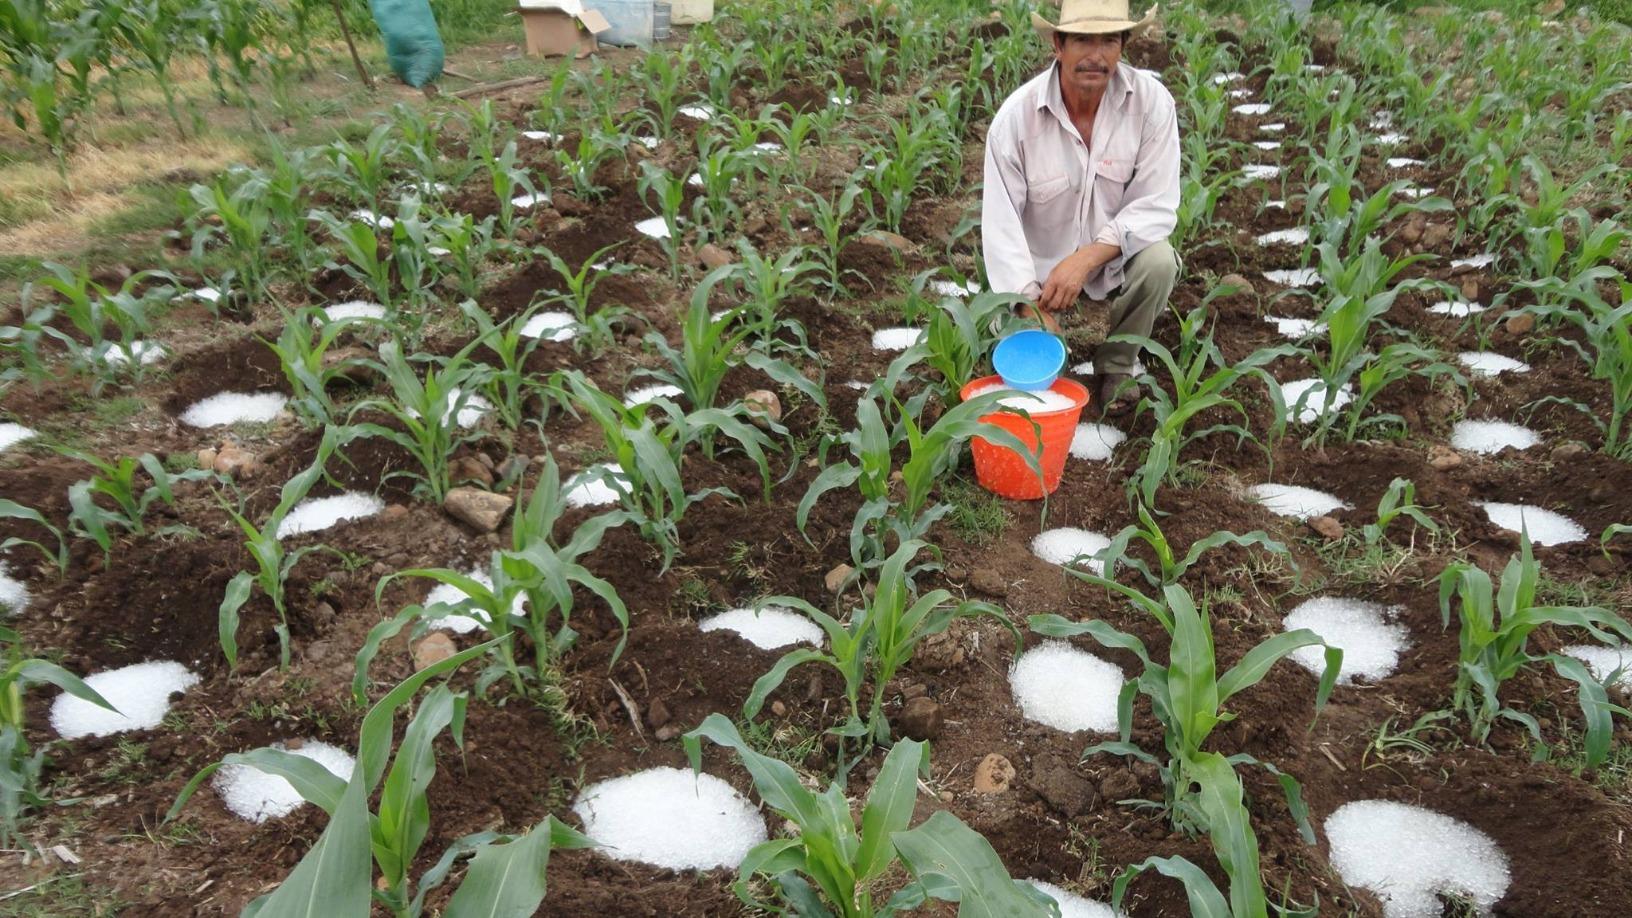 Lluvia Sólida: An economic lifeline for farmers in drier, unpredictable climate conditions